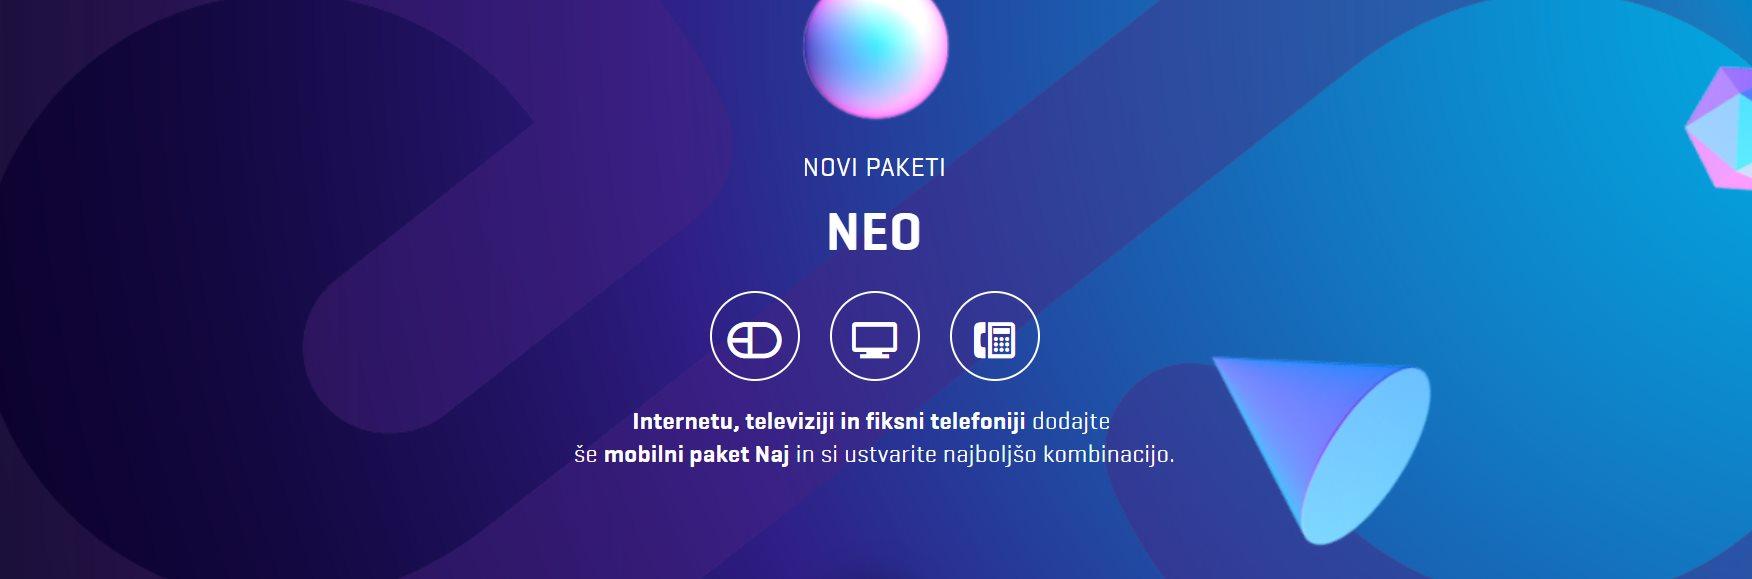 ts-paket-neo